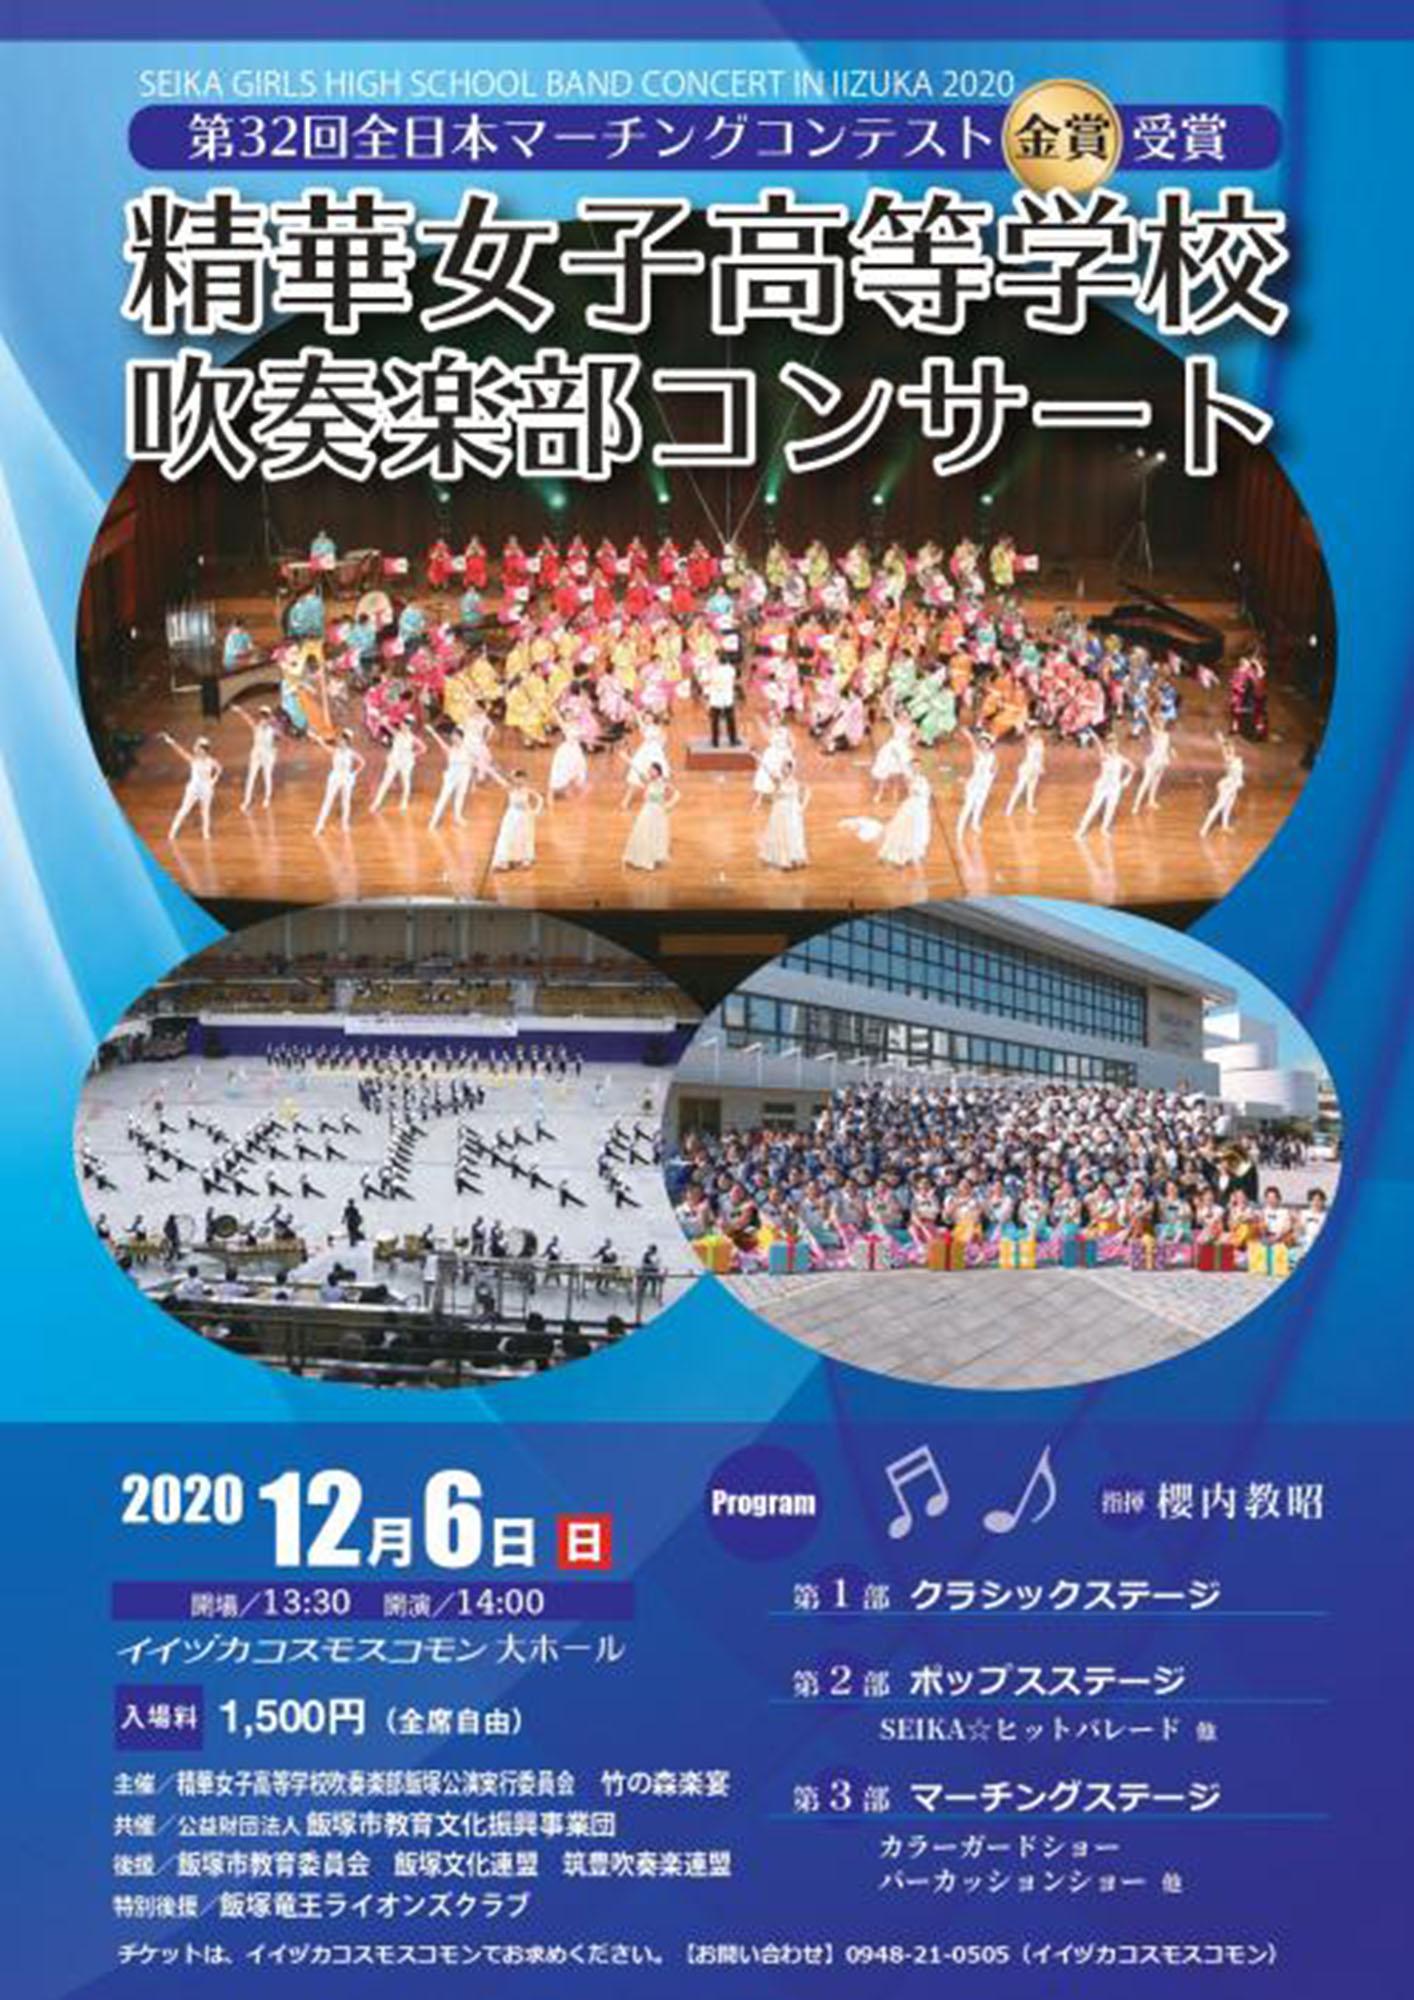 201206_seika_ghs_blassband_concert